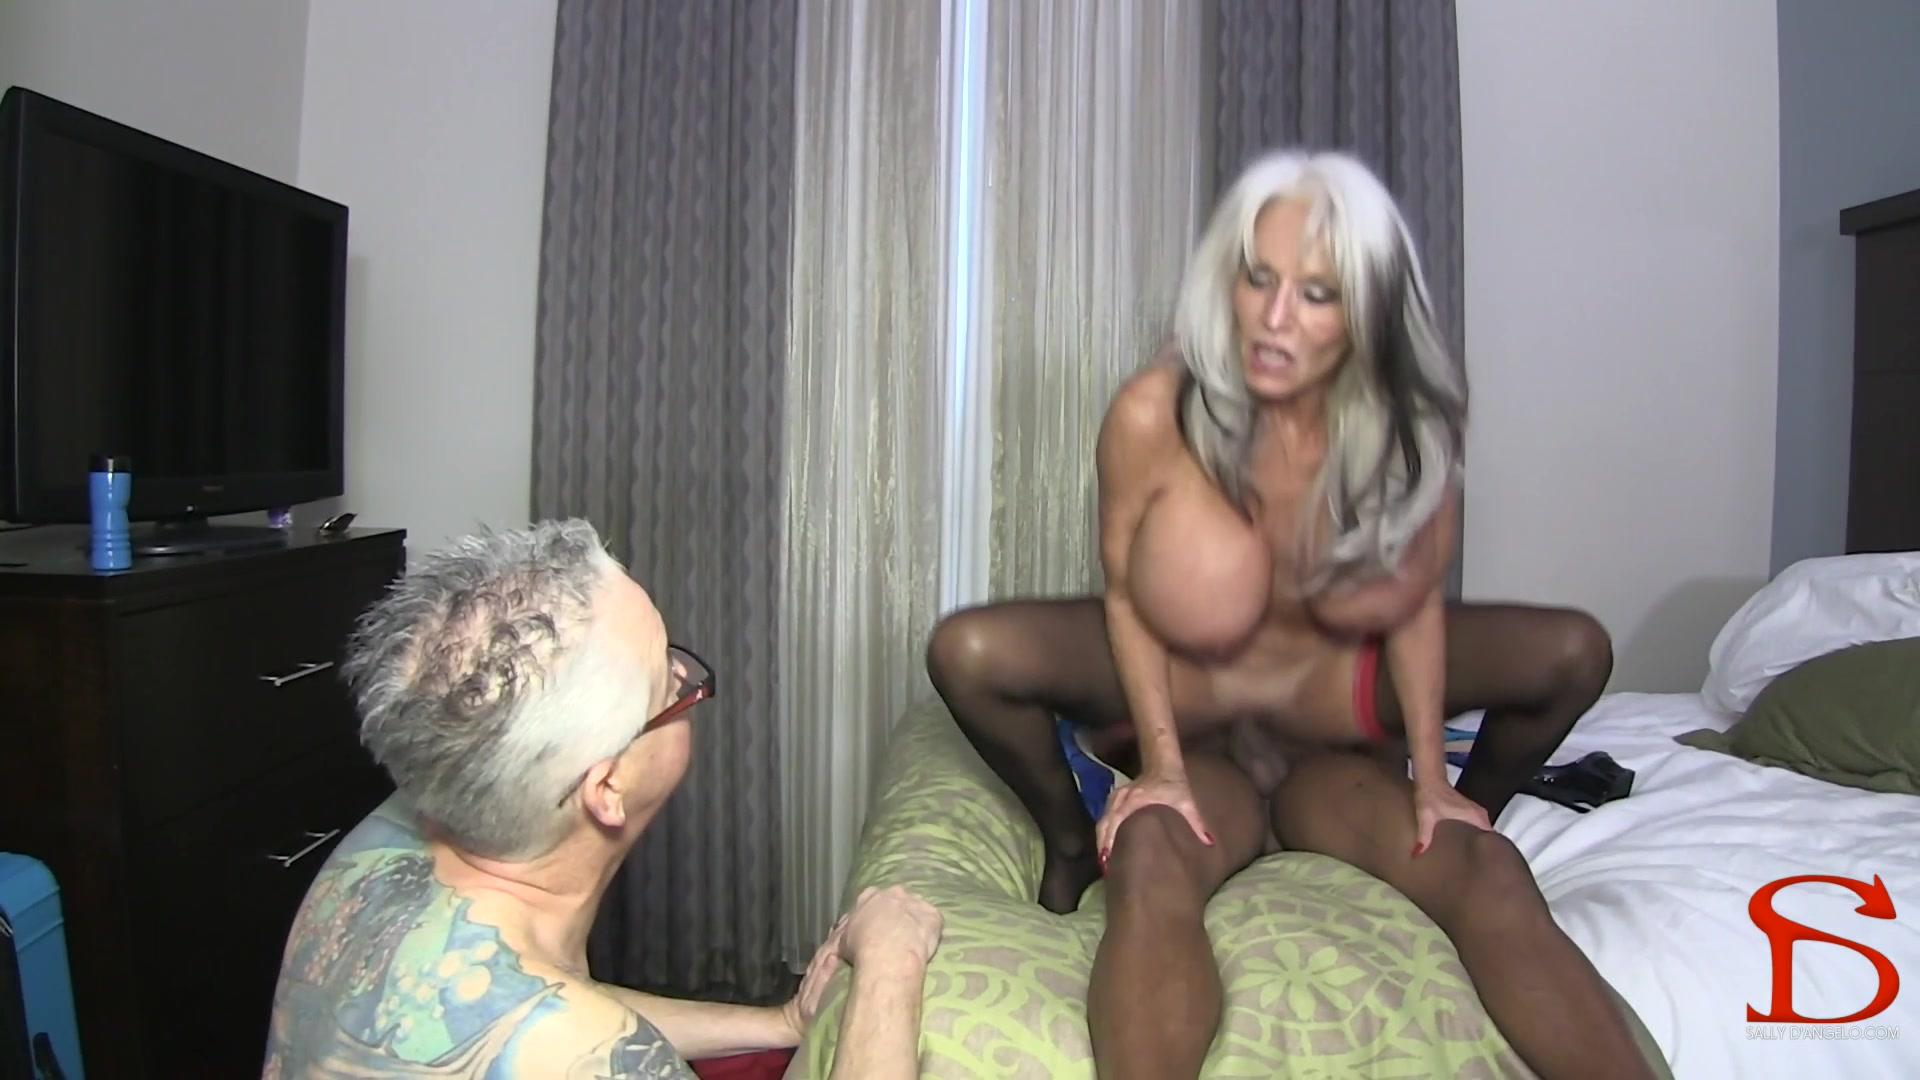 Free Streaming Porn Cuckold 99